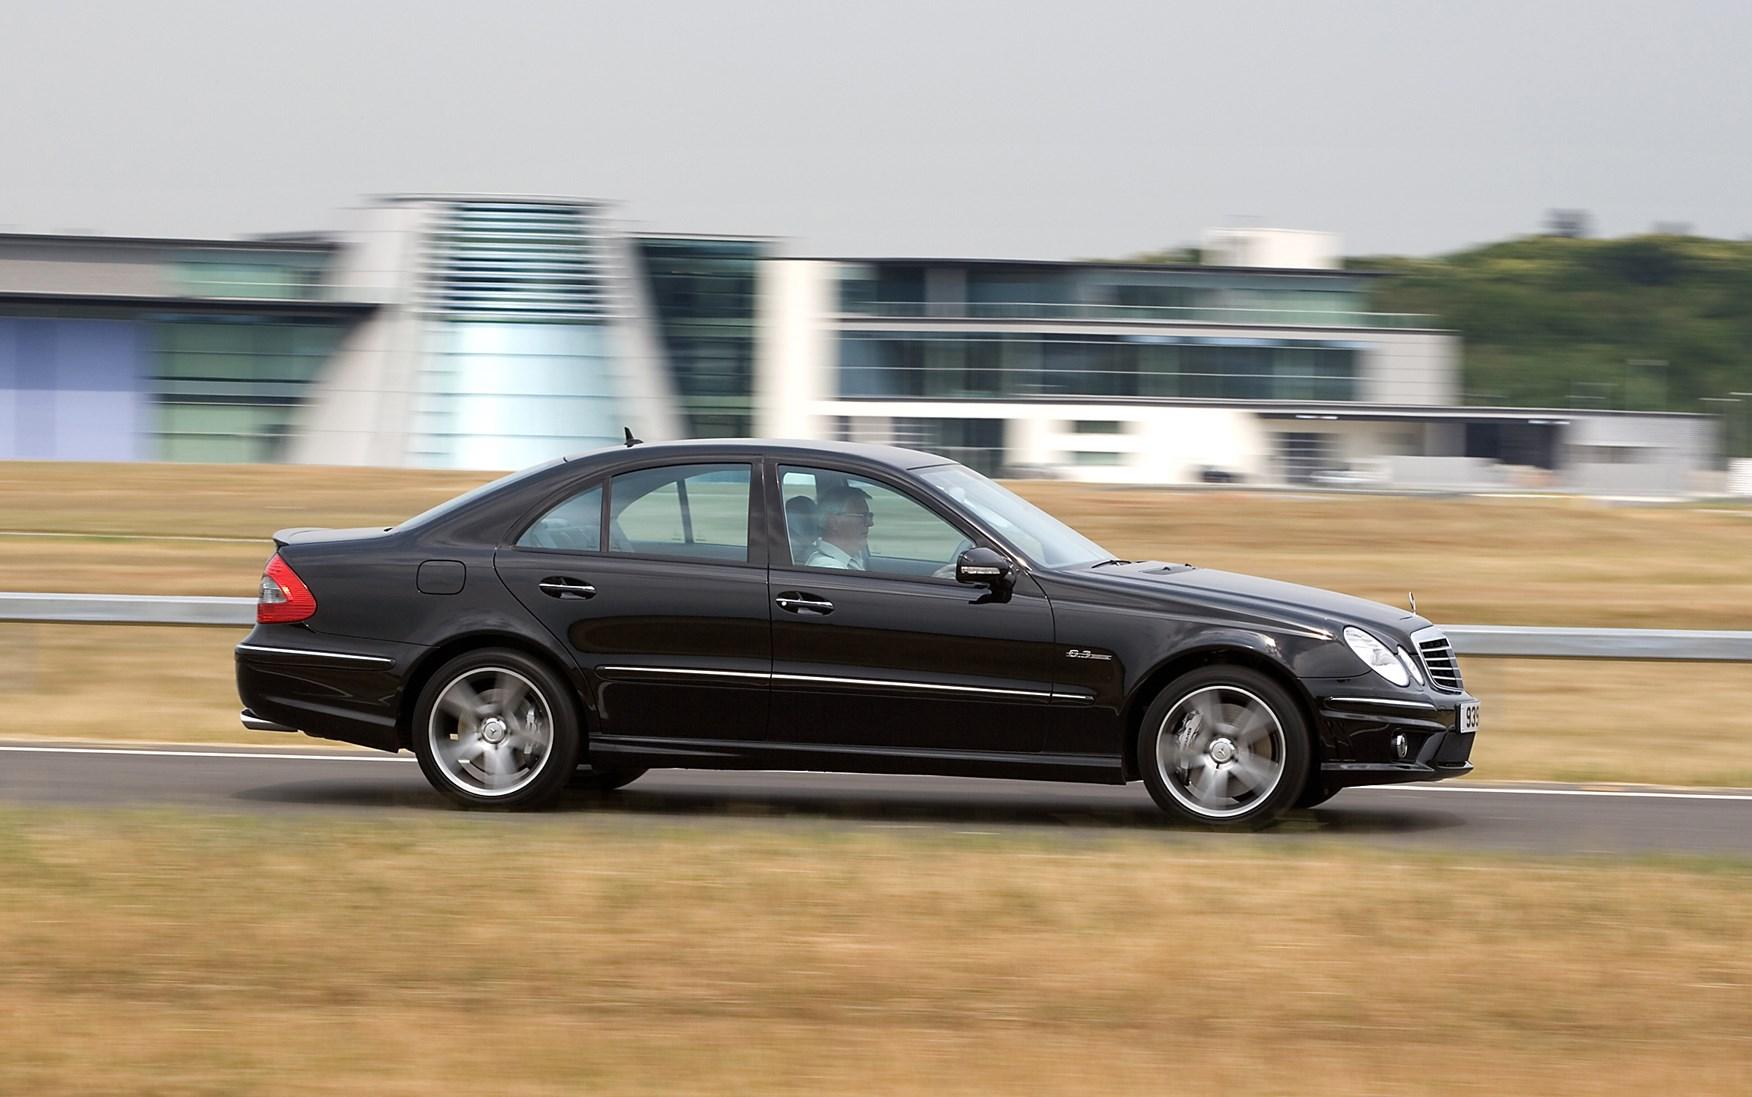 Mercedes benz e class amg 2002 2008 photos parkers for Mercedes benz 2002 e class